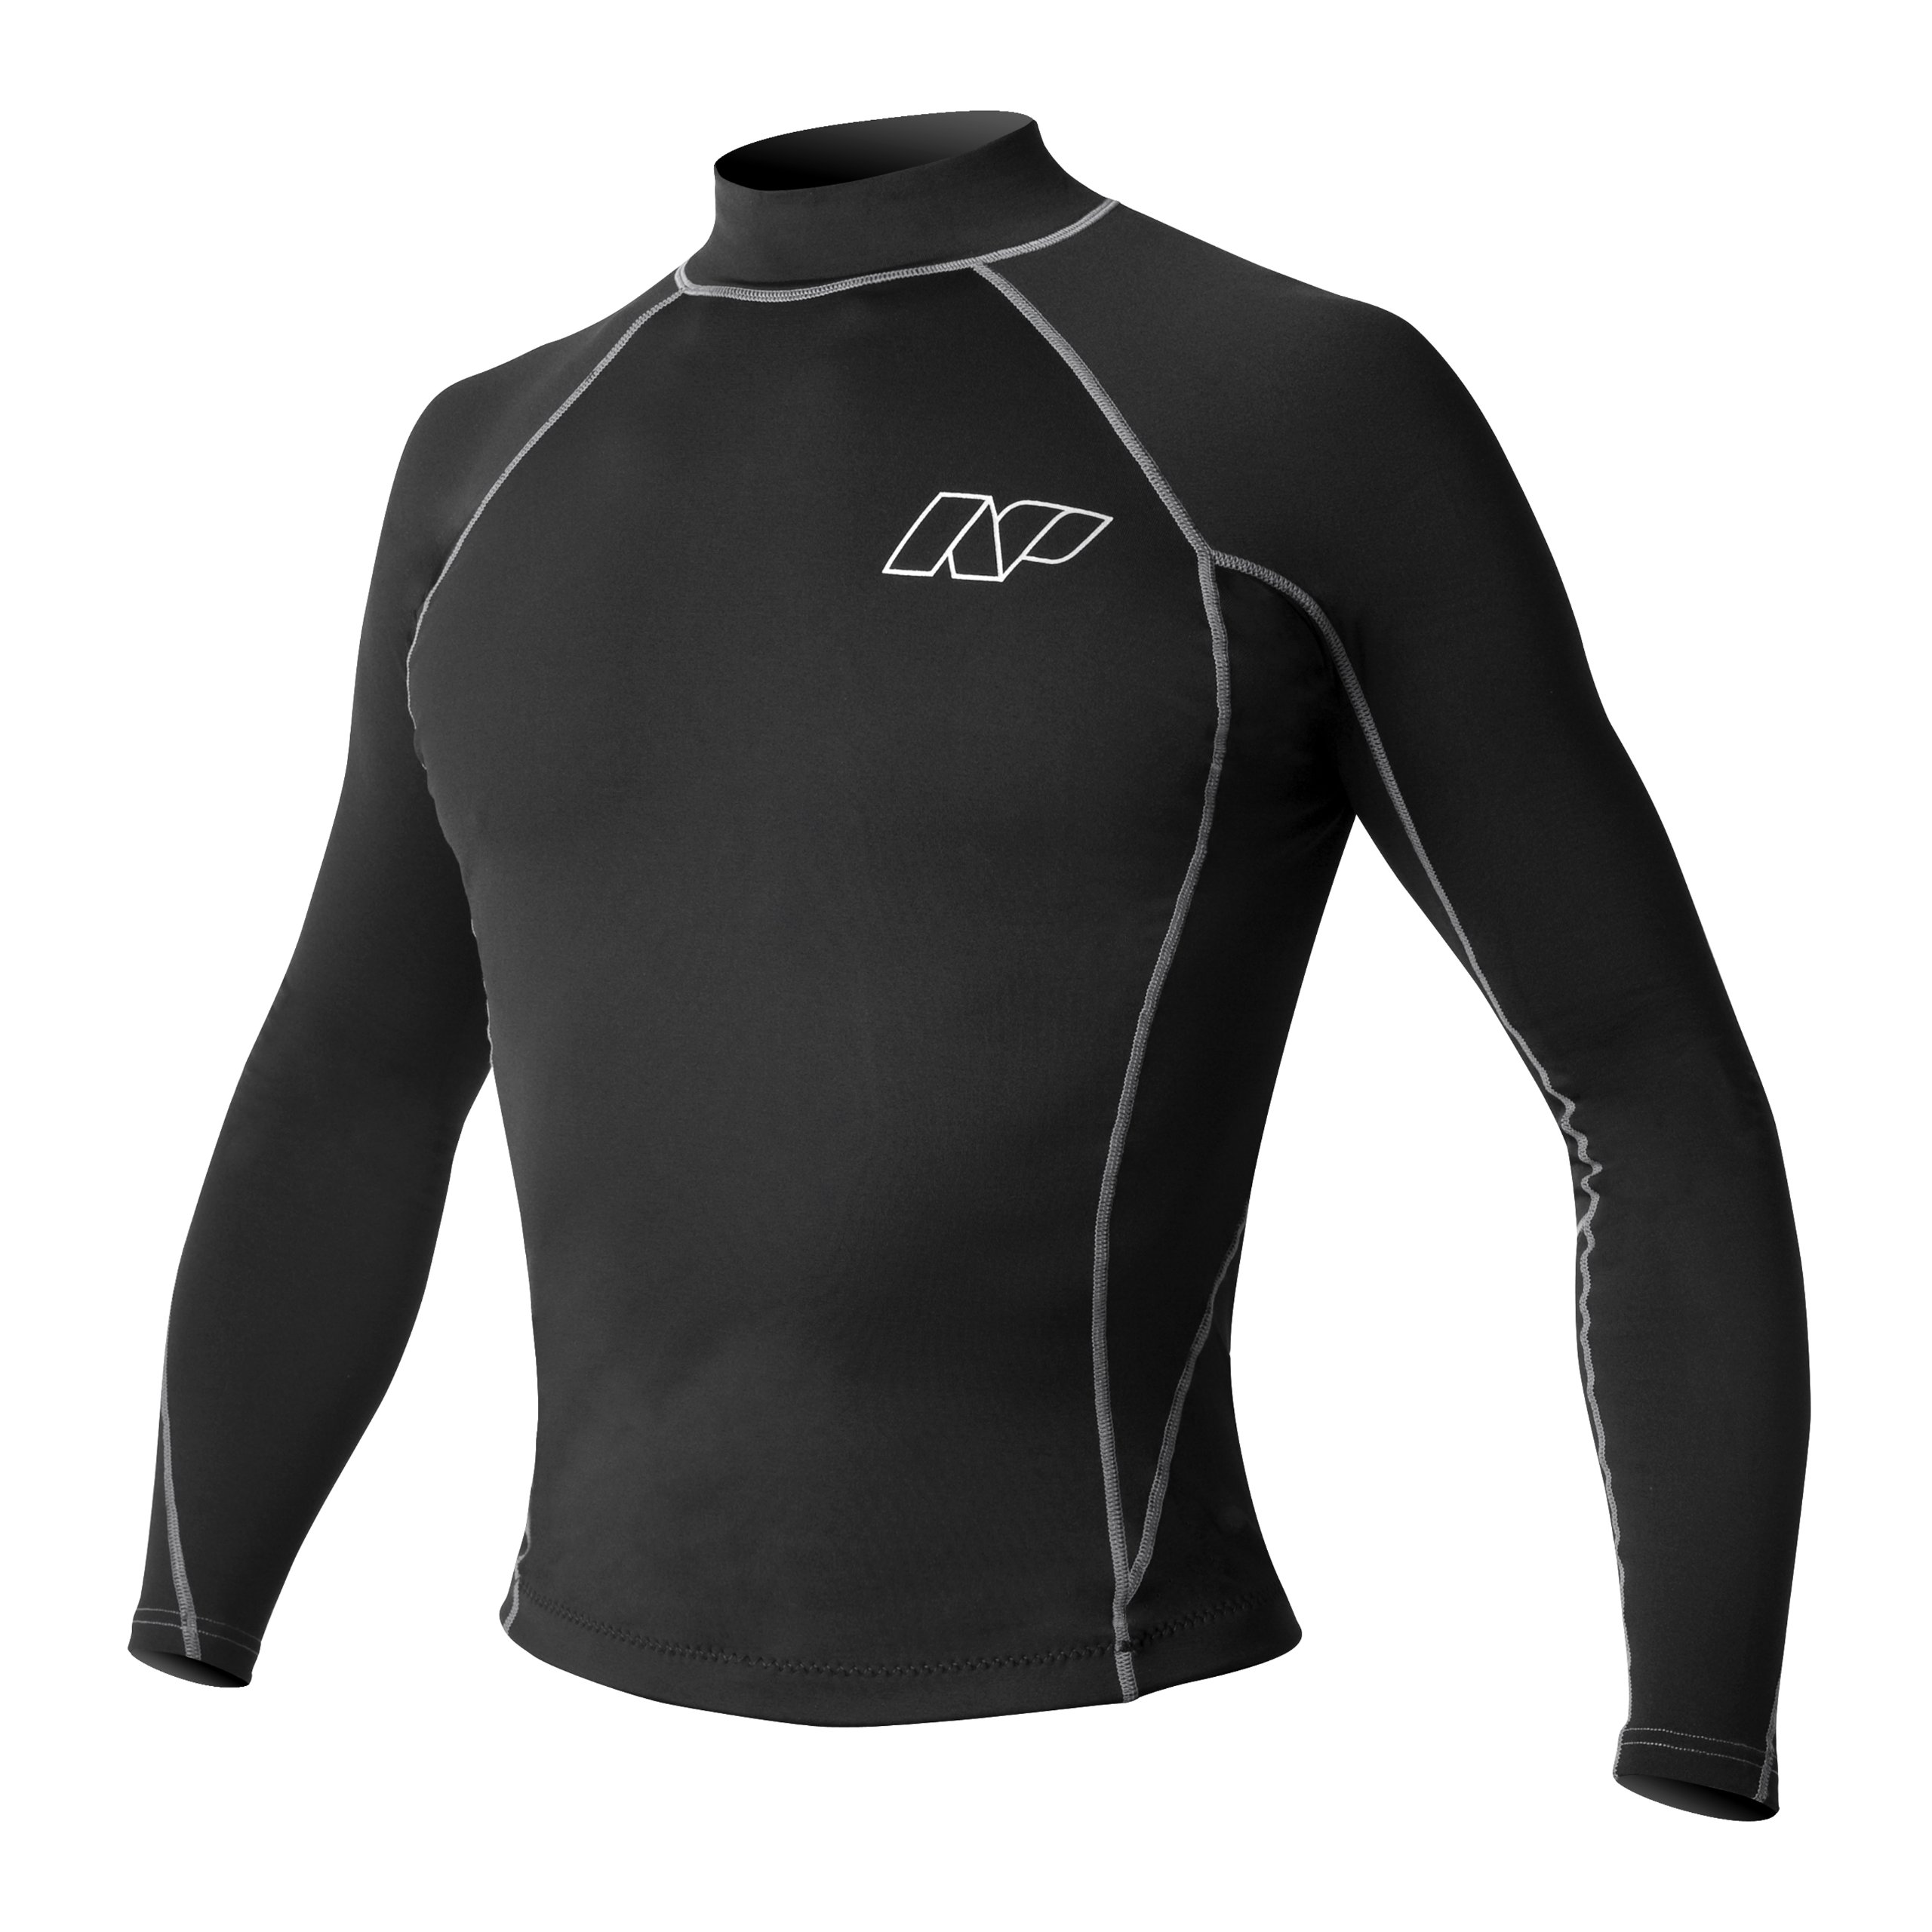 NP Surf Themalite Long Sleeve Rashguard Shirt, Black, Small